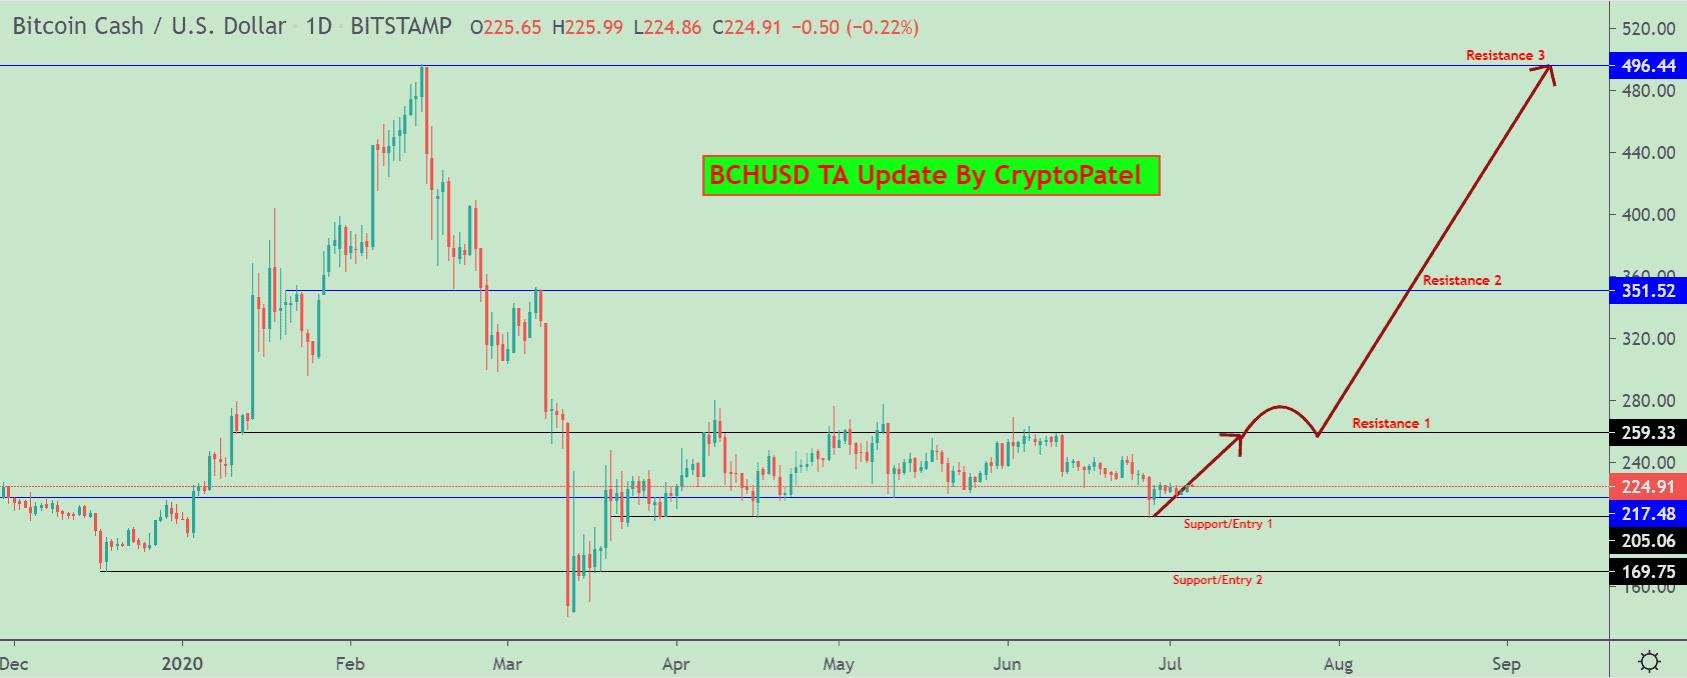 Bitcoin Cash price chart 2 - 5 July